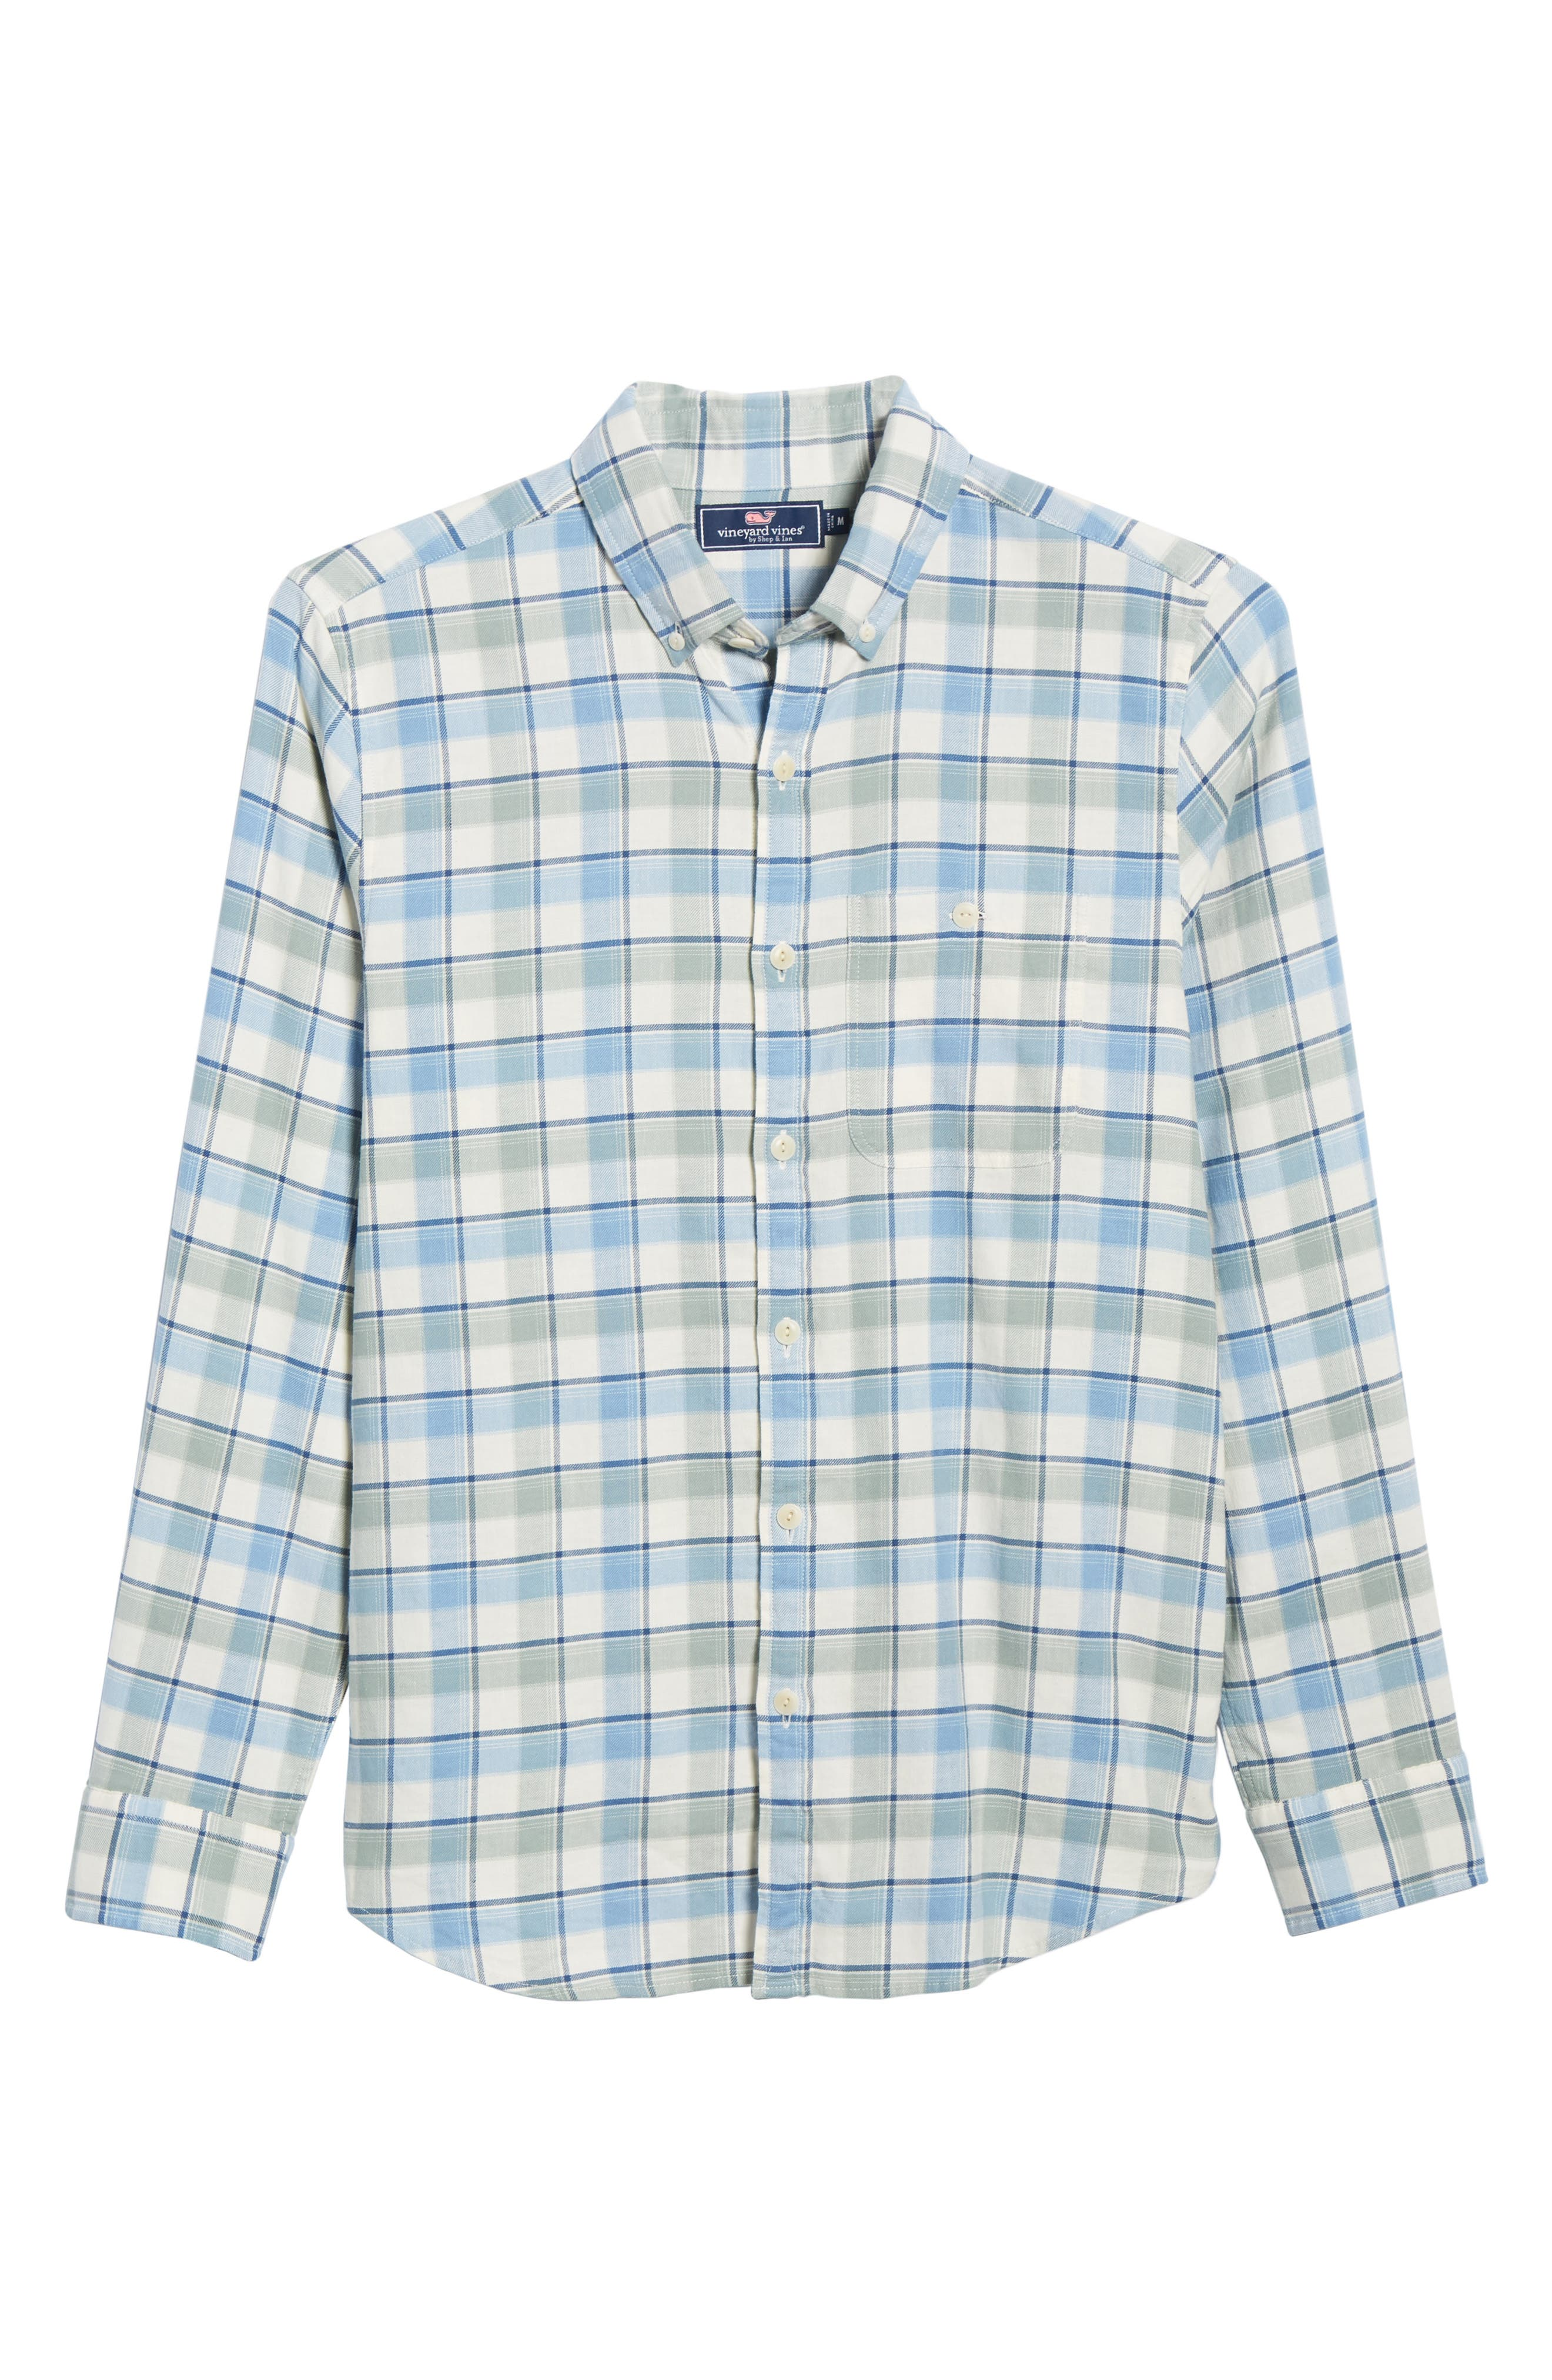 VINEYARD VINES,                             Bayside Slim Fit Plaid Sport Shirt,                             Alternate thumbnail 5, color,                             LIGHT SAGE